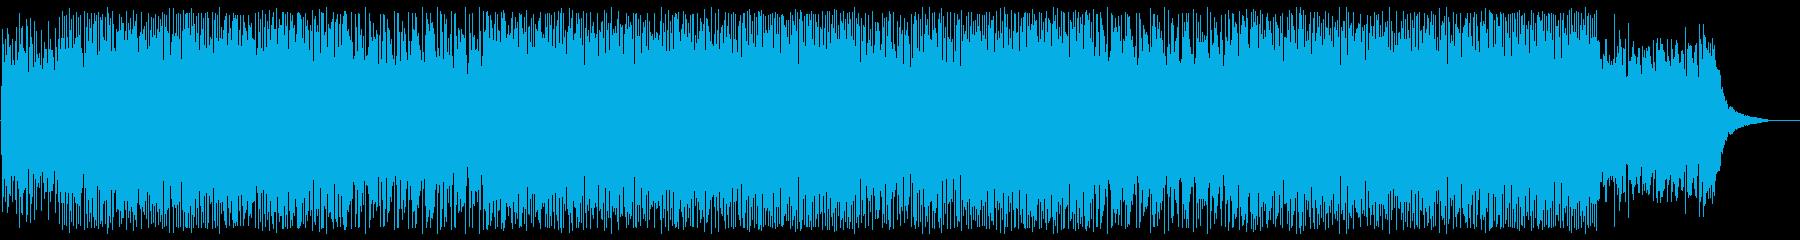 bpmが早くピアノ混じりのシンセサイザーの再生済みの波形